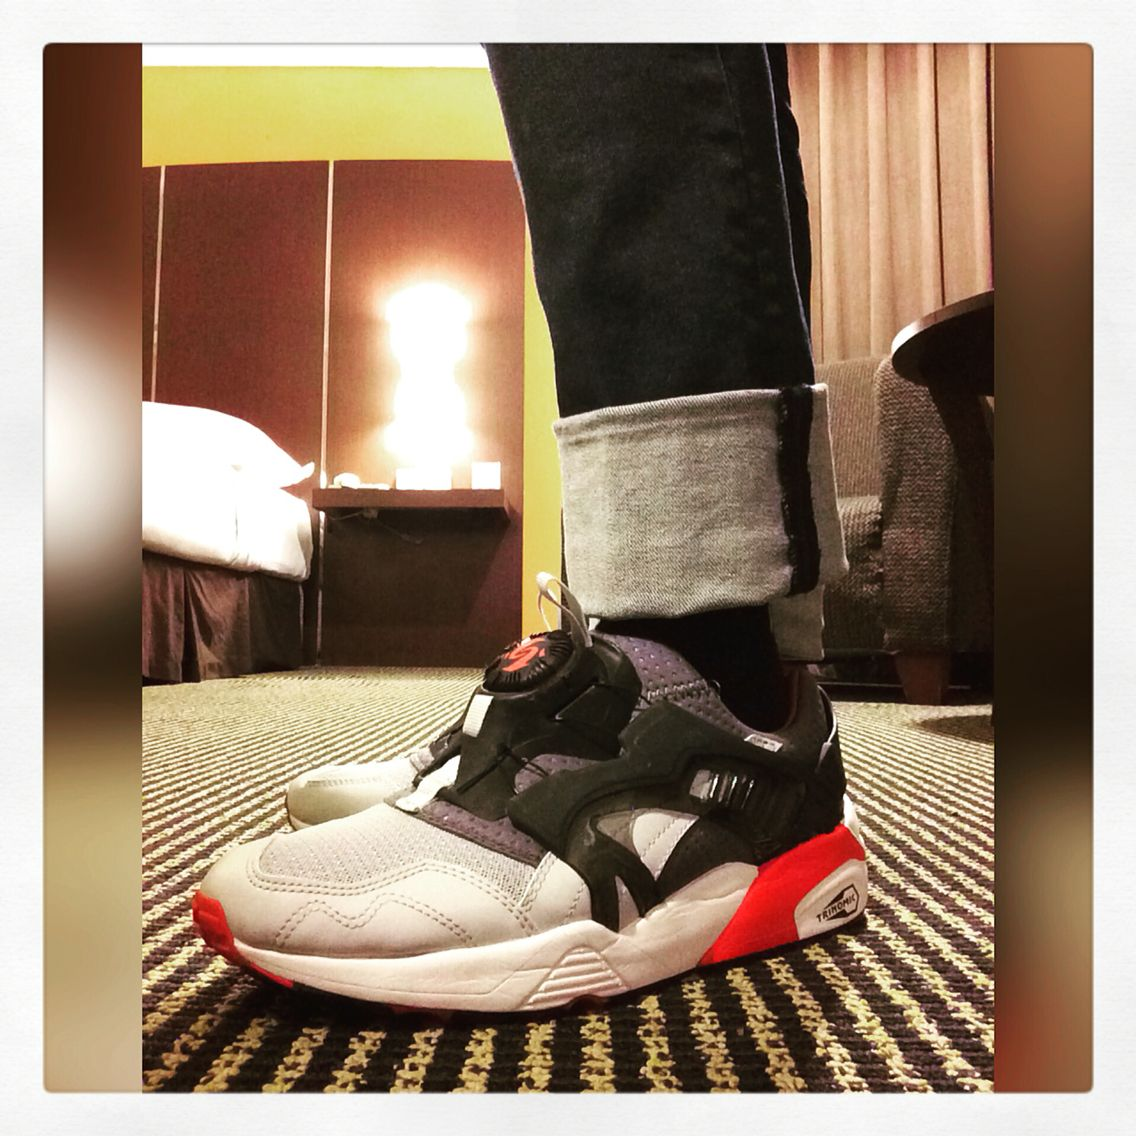 New years sneakers! Powered by Puma #Puma #PumaDisc #PumaDiscTrinomic #Trinomic